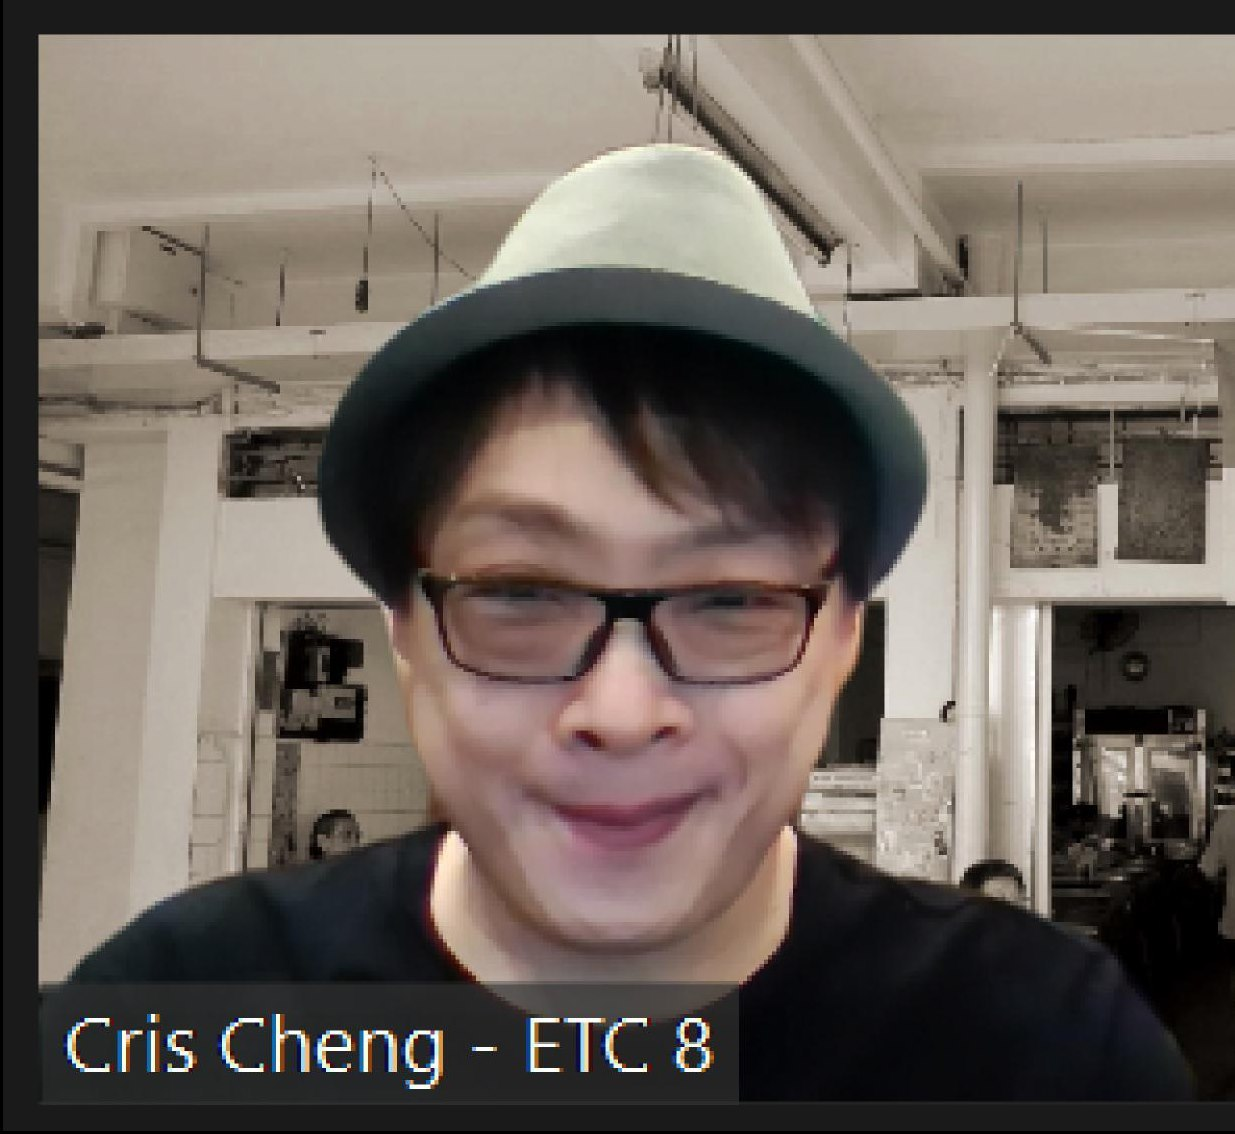 Cris Cheng